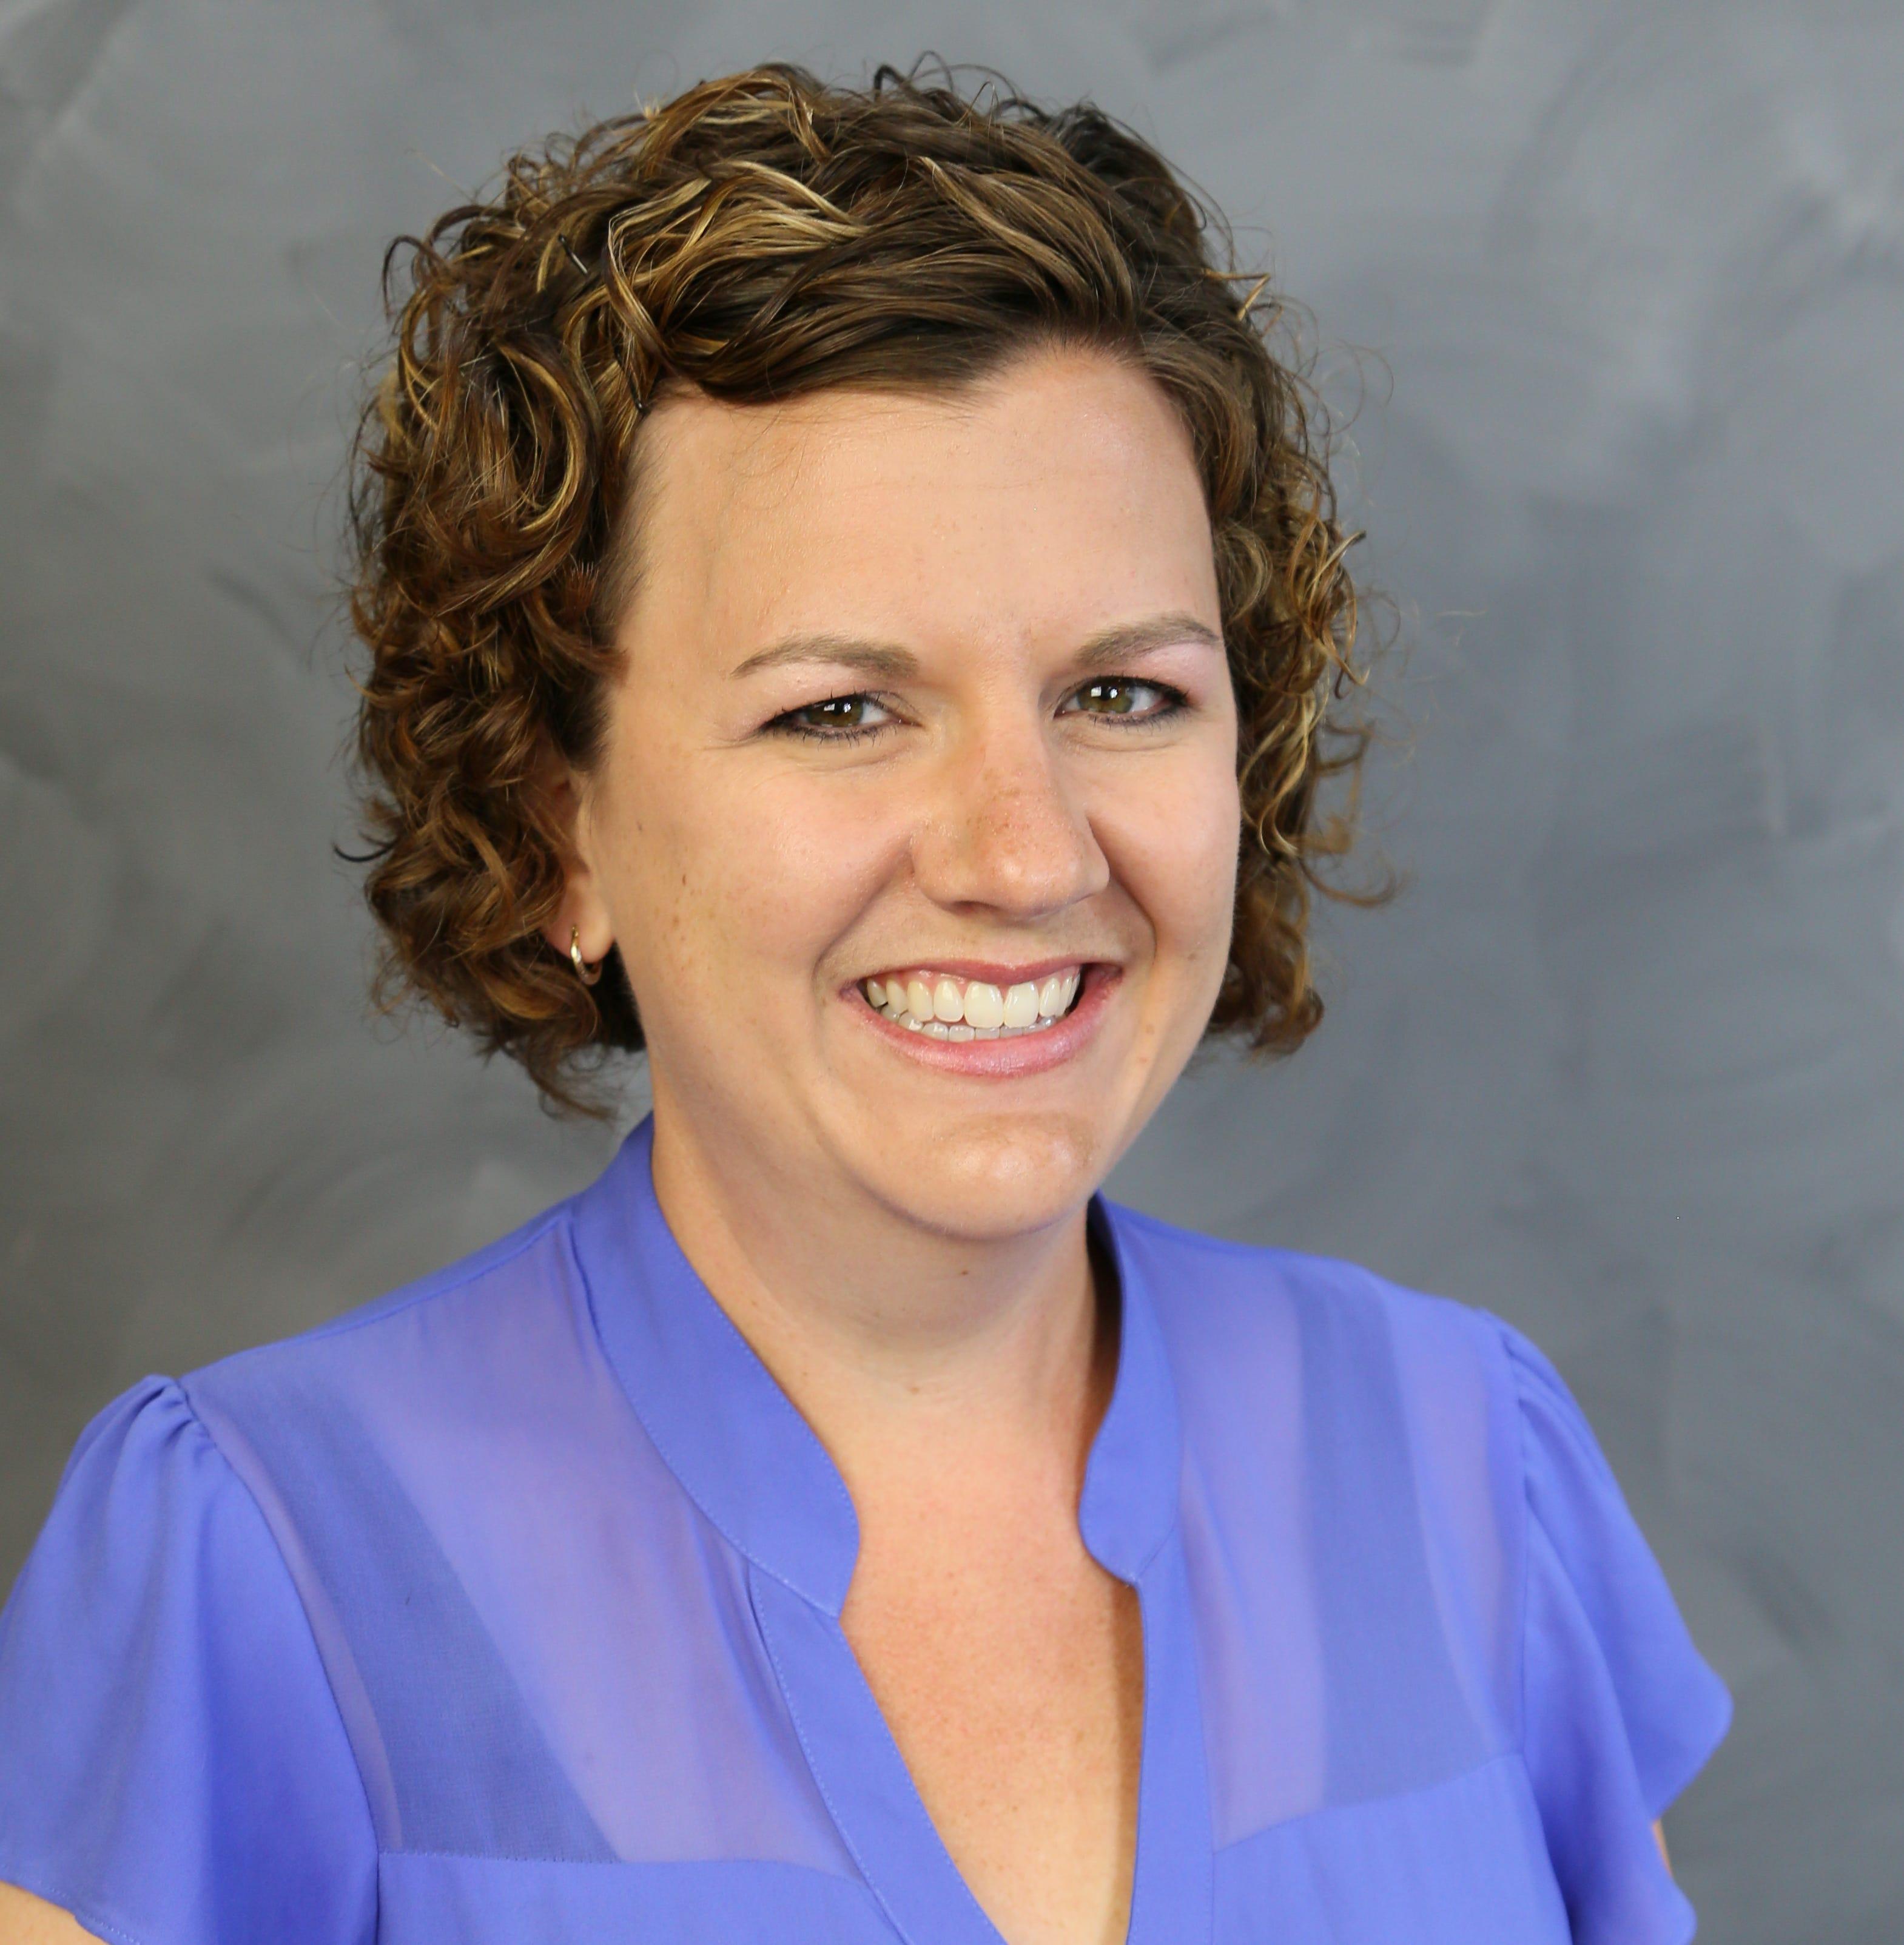 Leah Sams, career technical education coordinator at St. Cloud school district